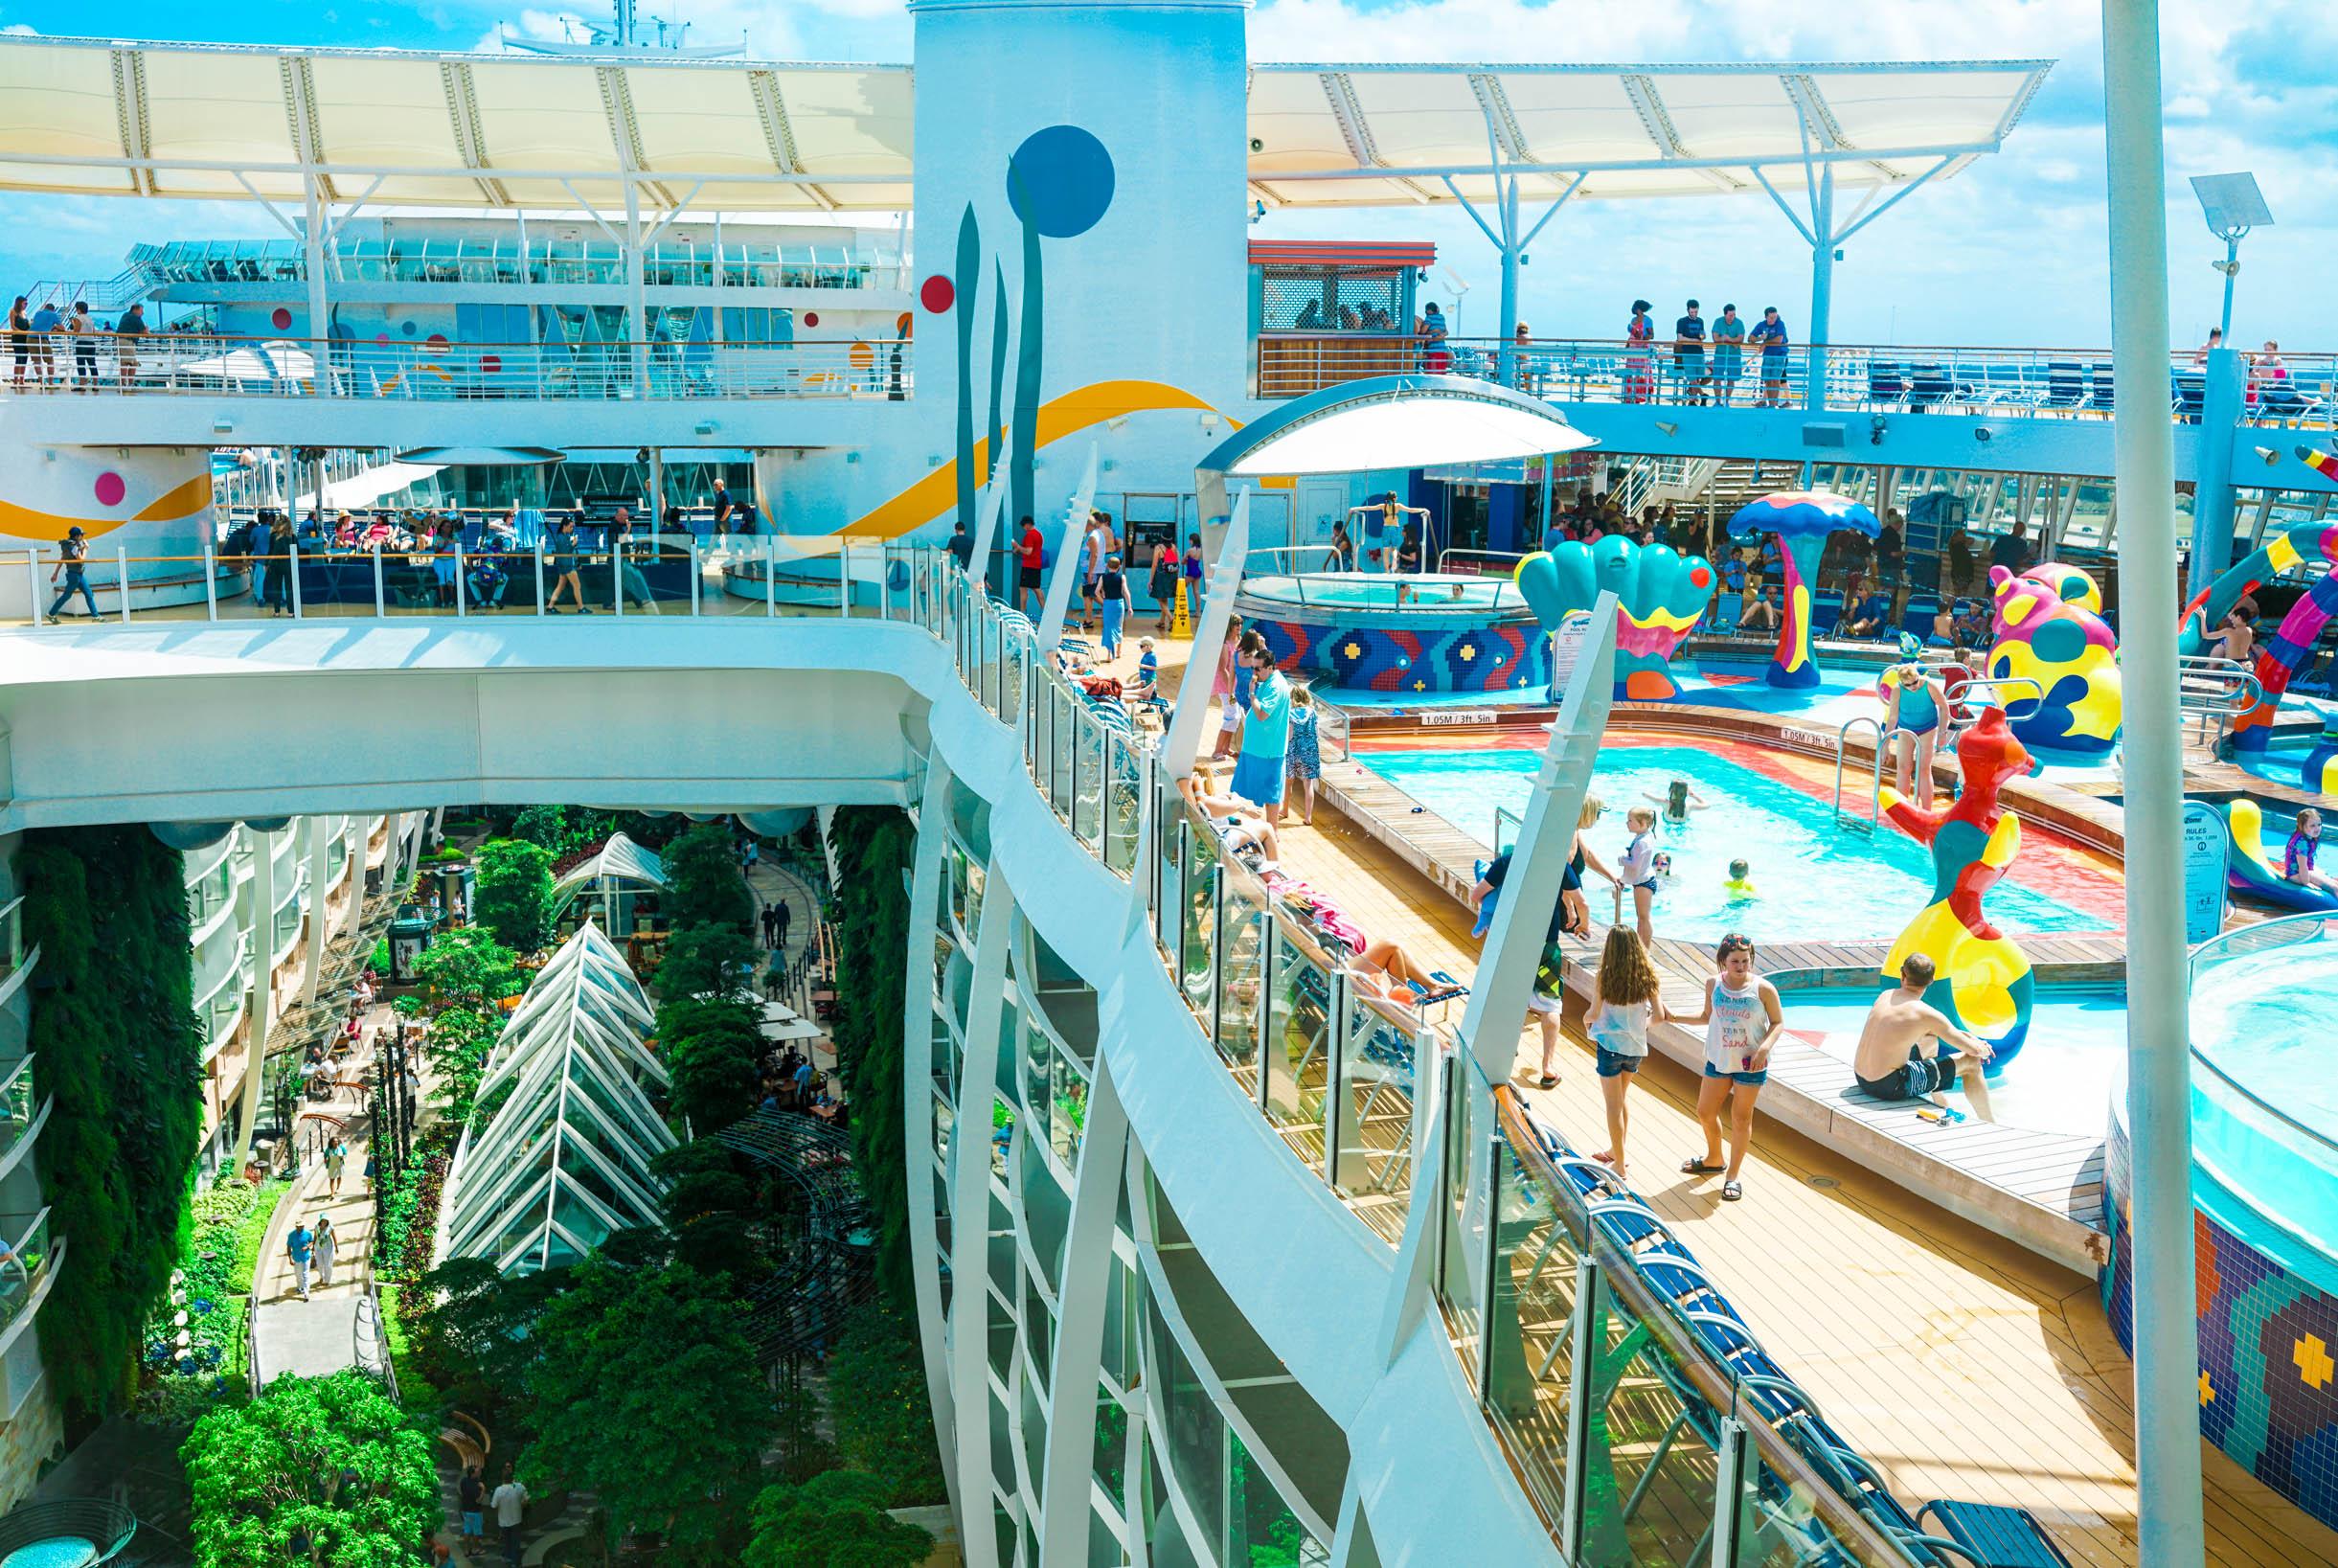 �'Ҽ��ձ����� Royal Caribbean Cruise ���������� Allure of the Seas ����������+������˹+������Ӷ������ձȺ�14���������� 2020��01��23�ձ������� ������Ǵ� ���߱��:7720012311